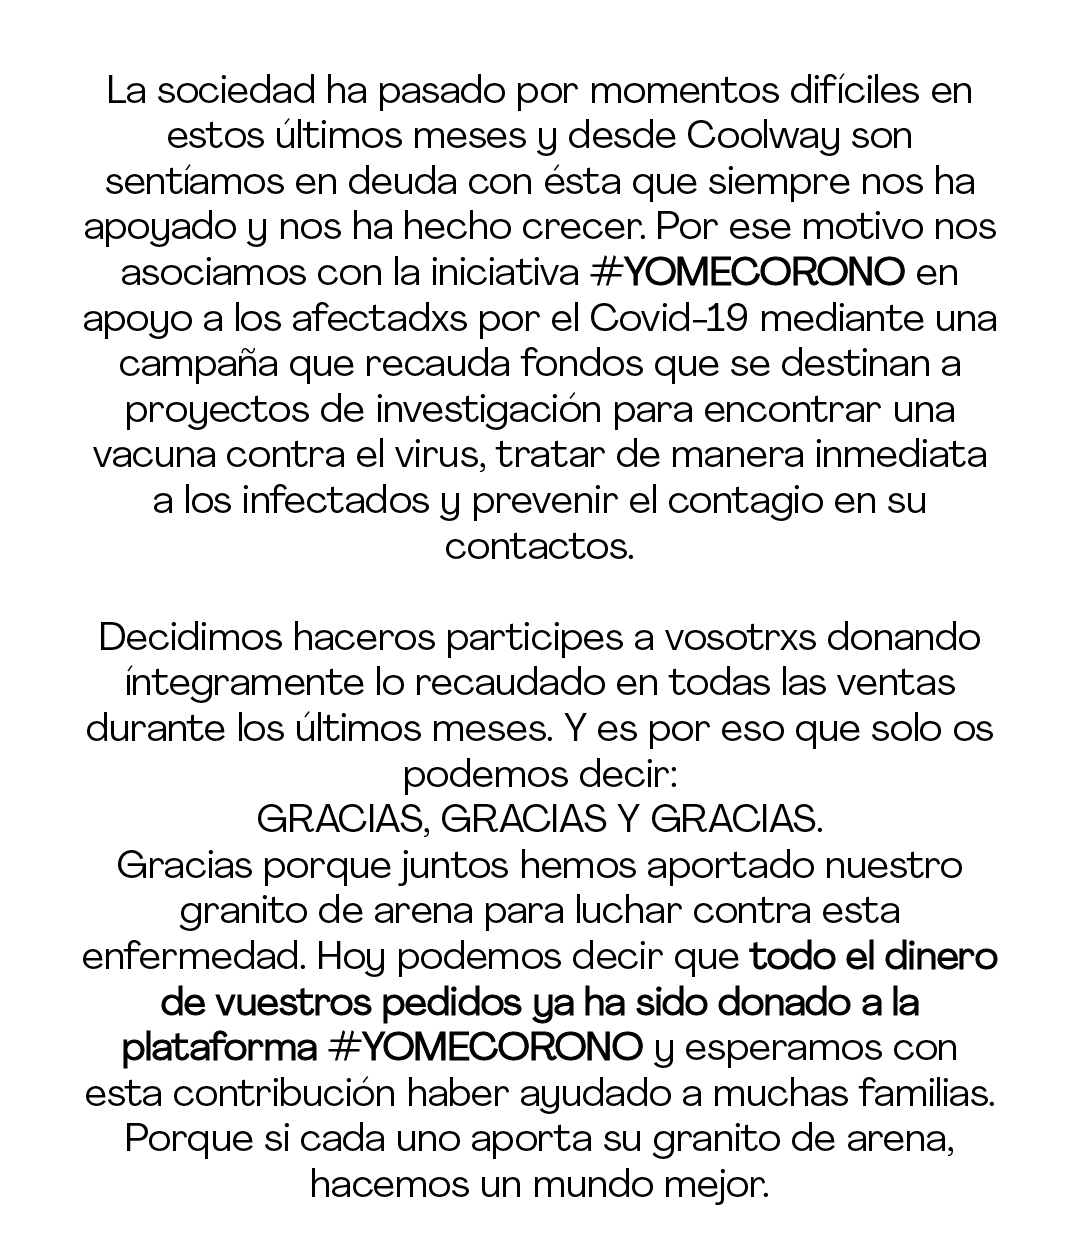 #yomecorono